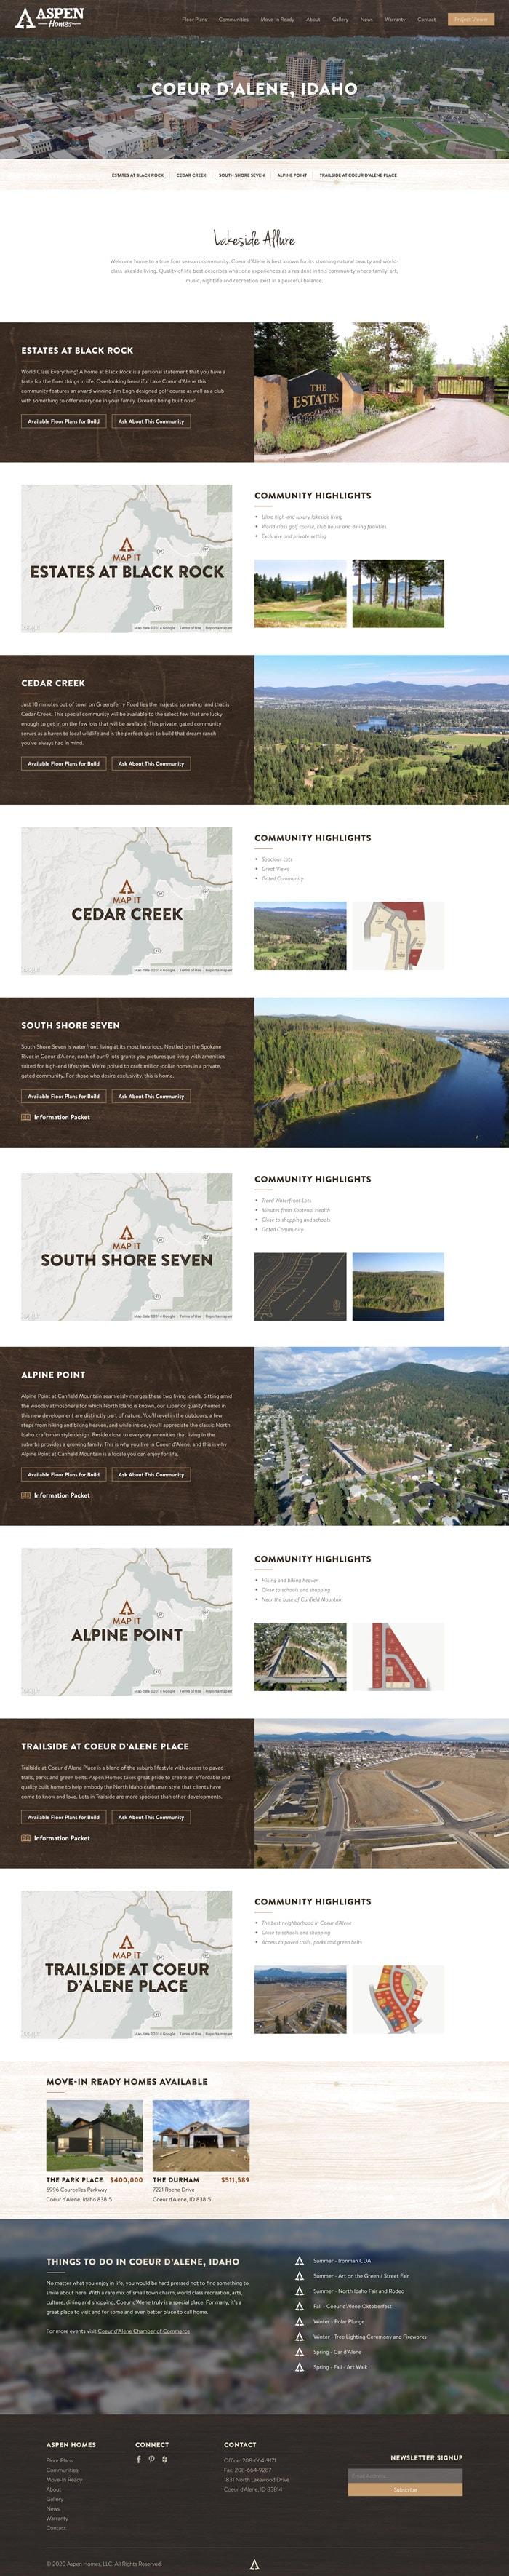 Aspen Homes City website mockup